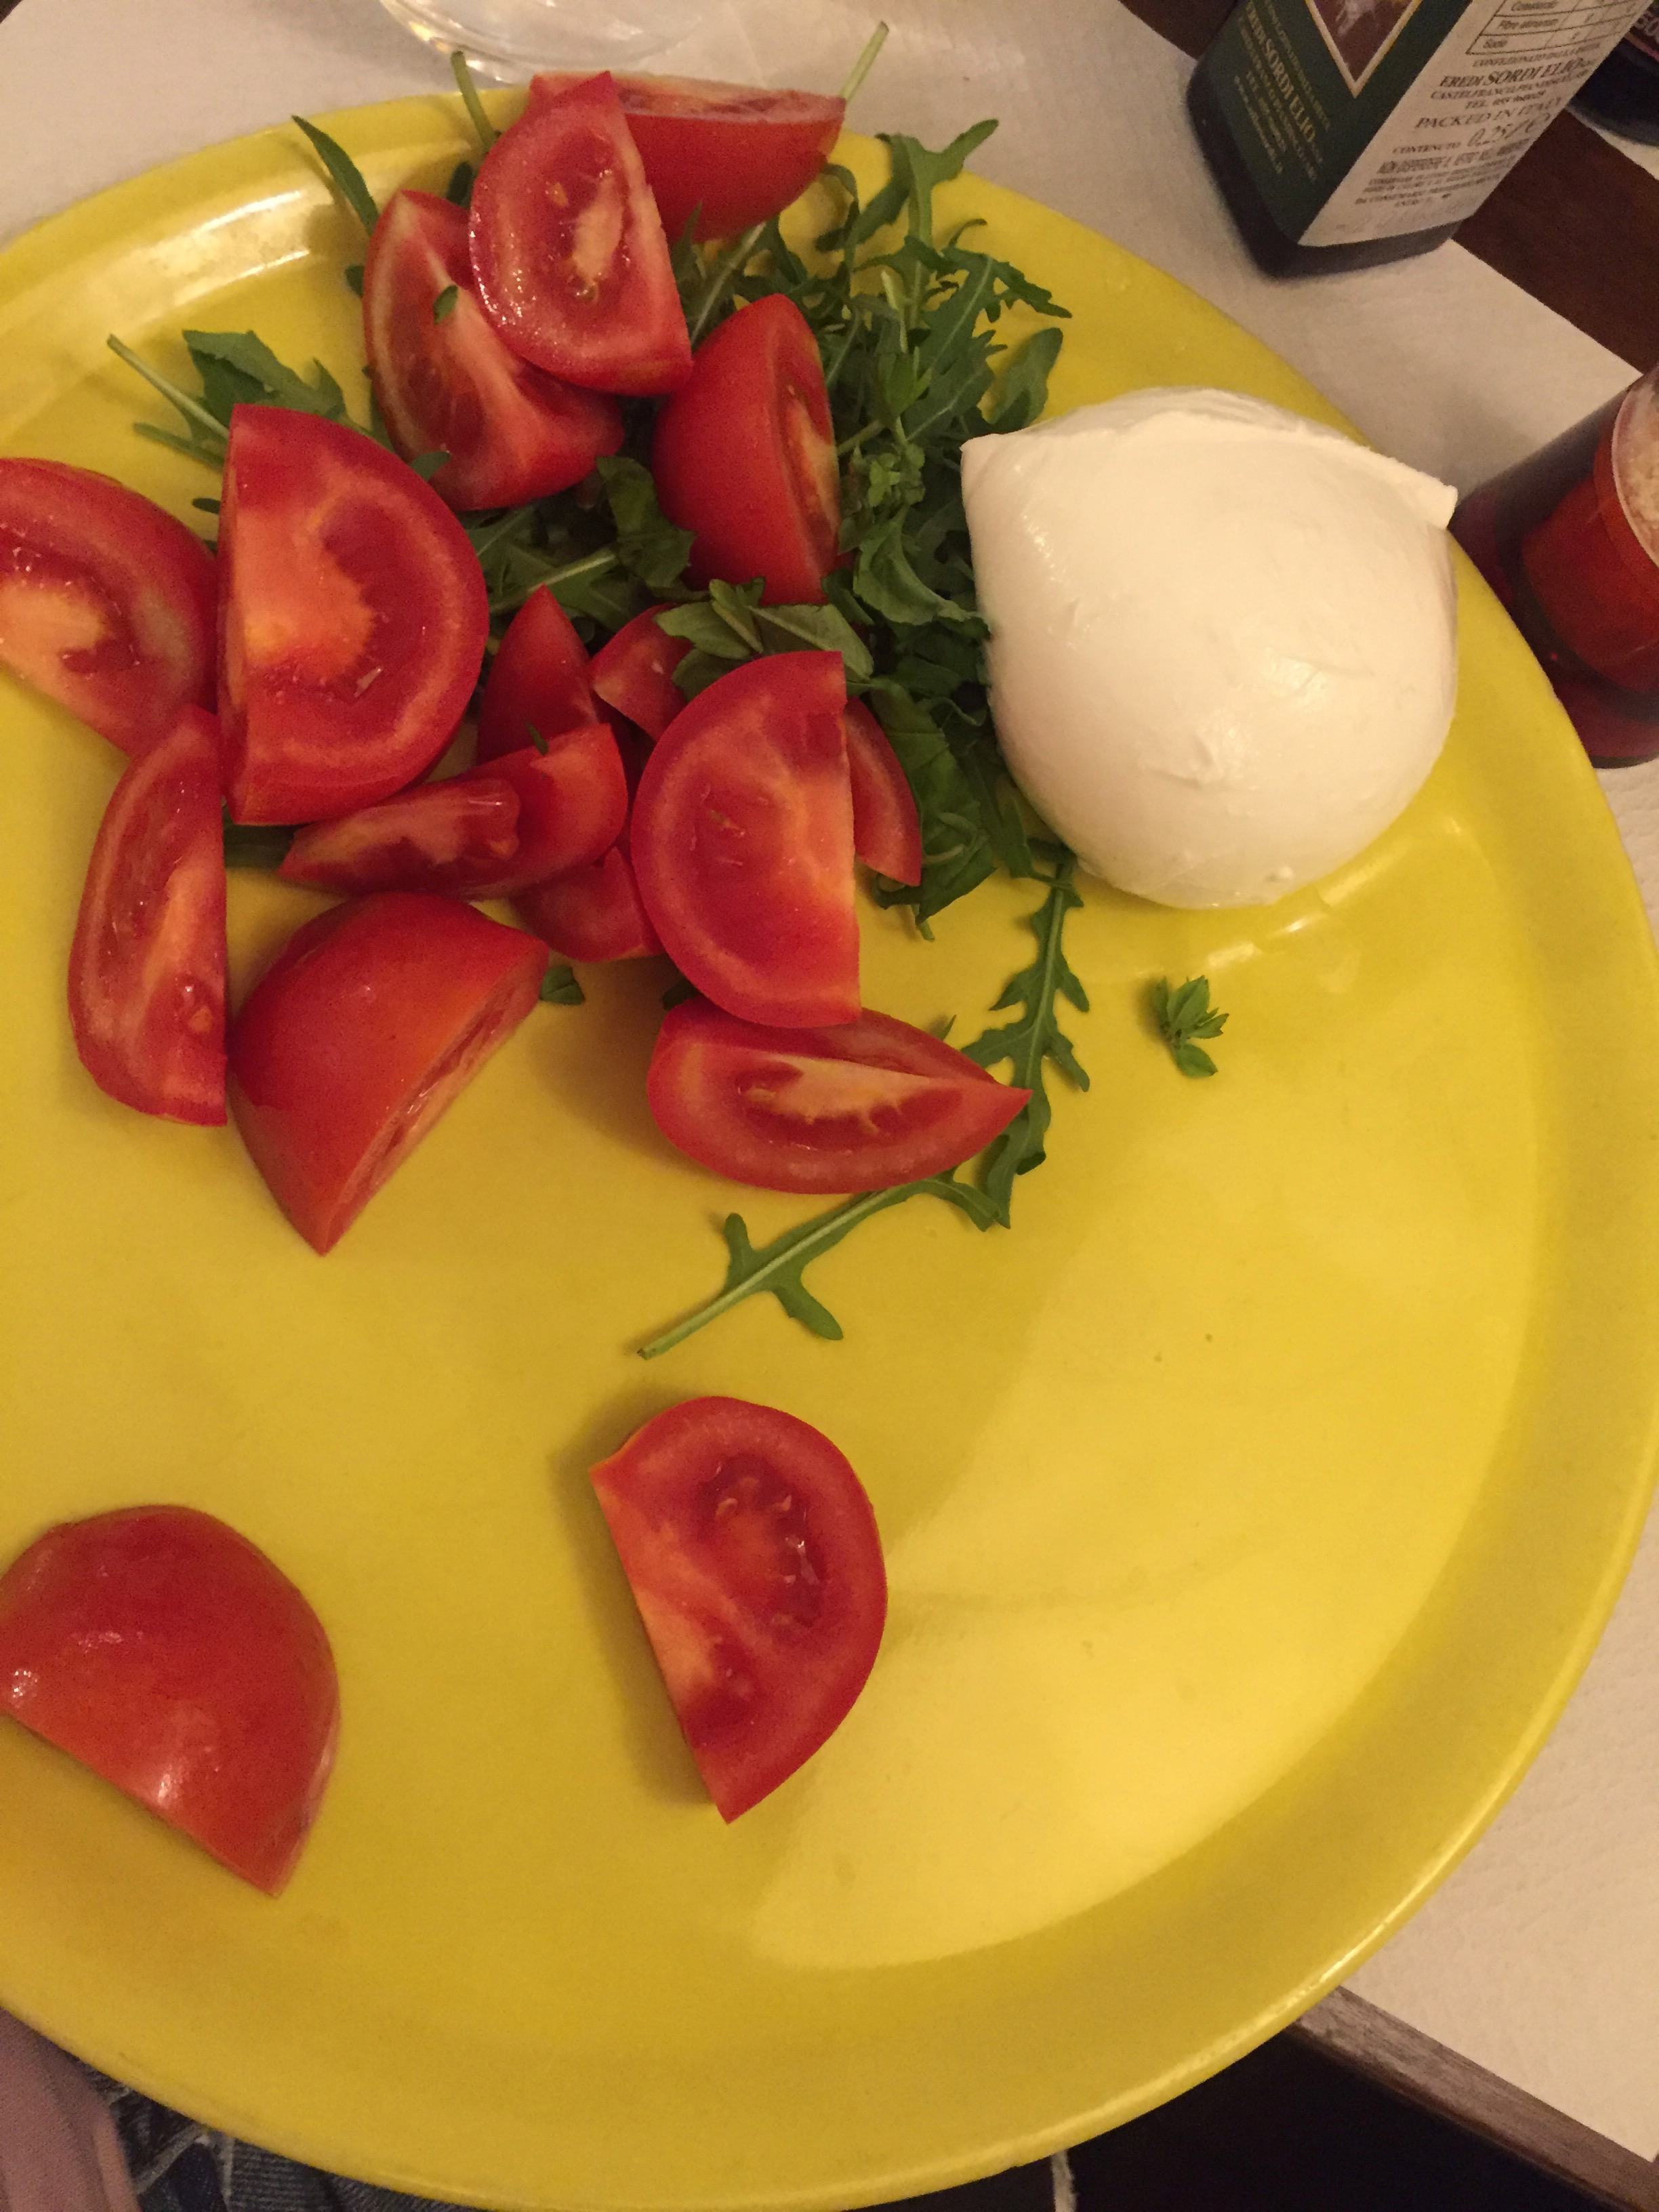 caprese salad at Cafe degli Artisti